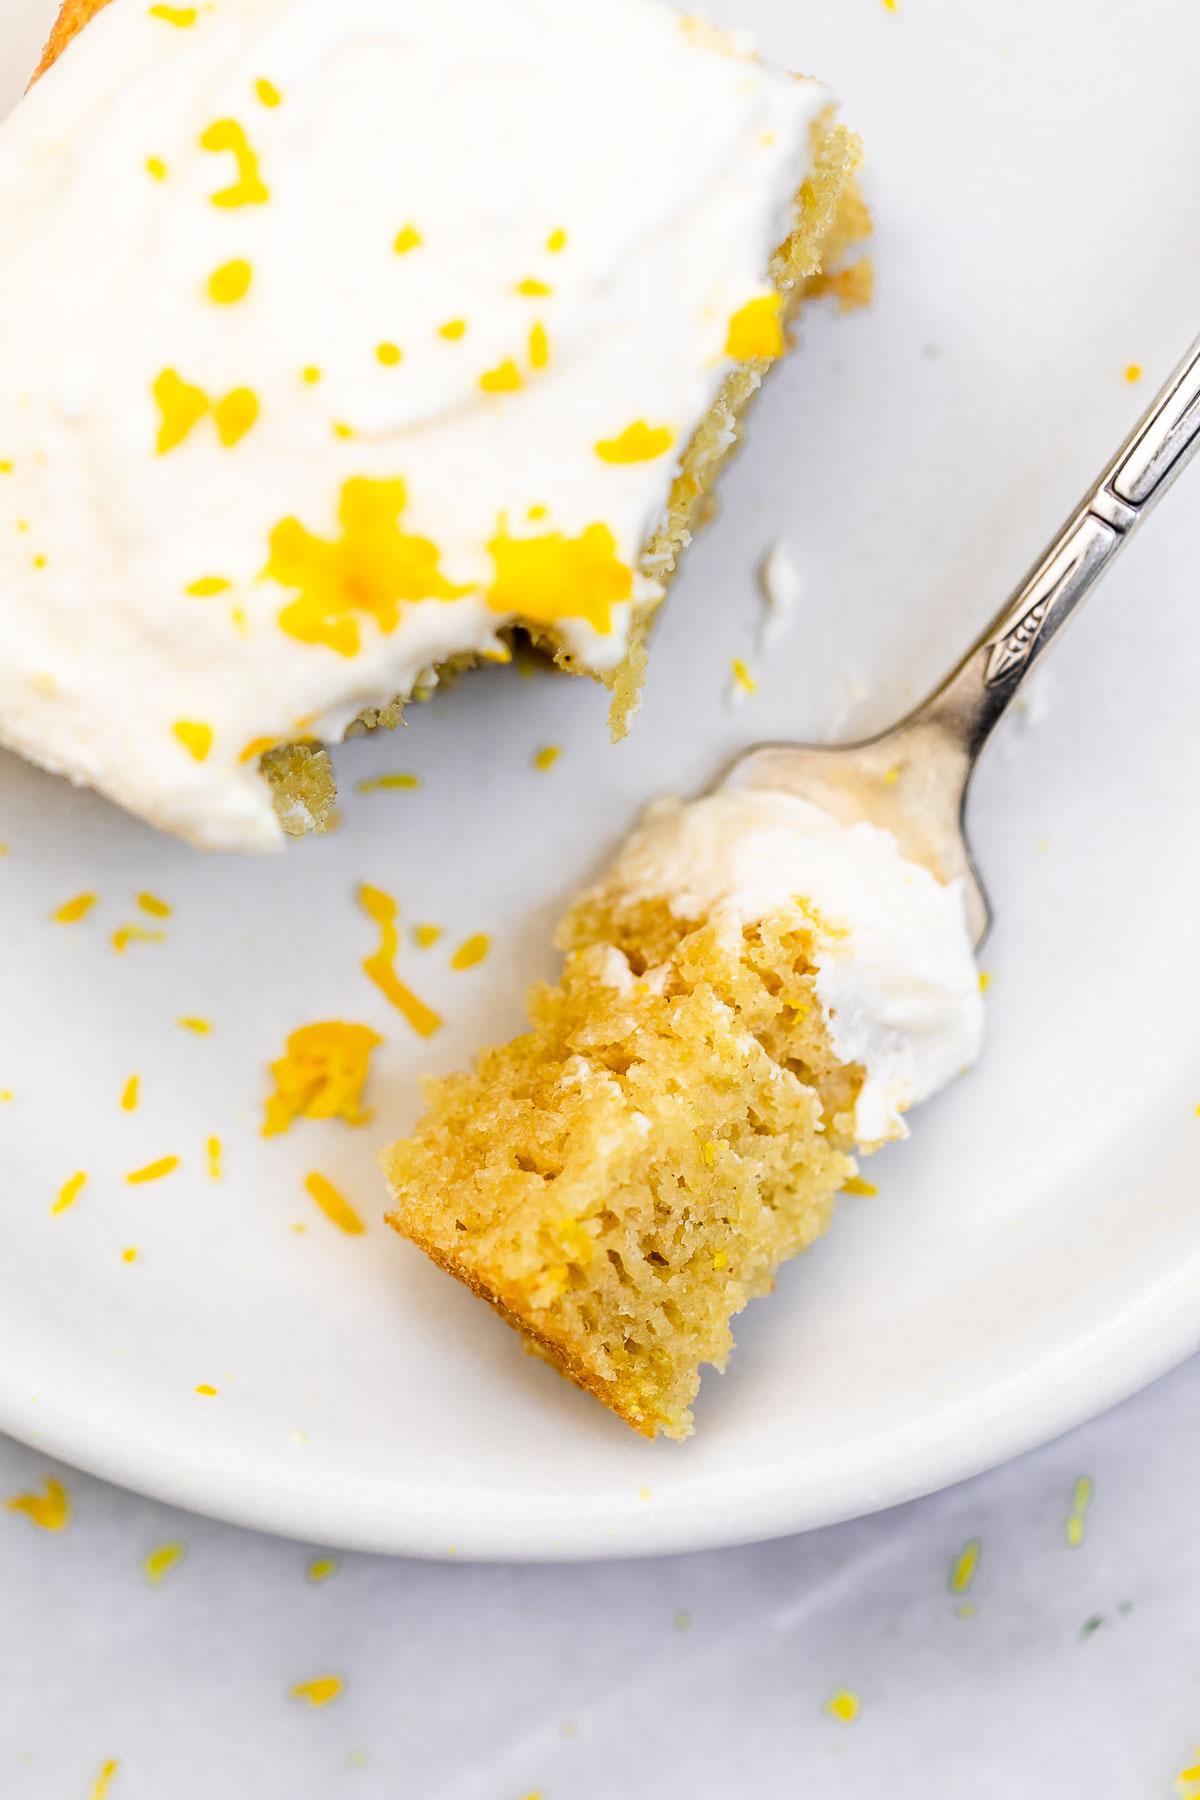 One bite of the gluten free lemon cake on a fork.